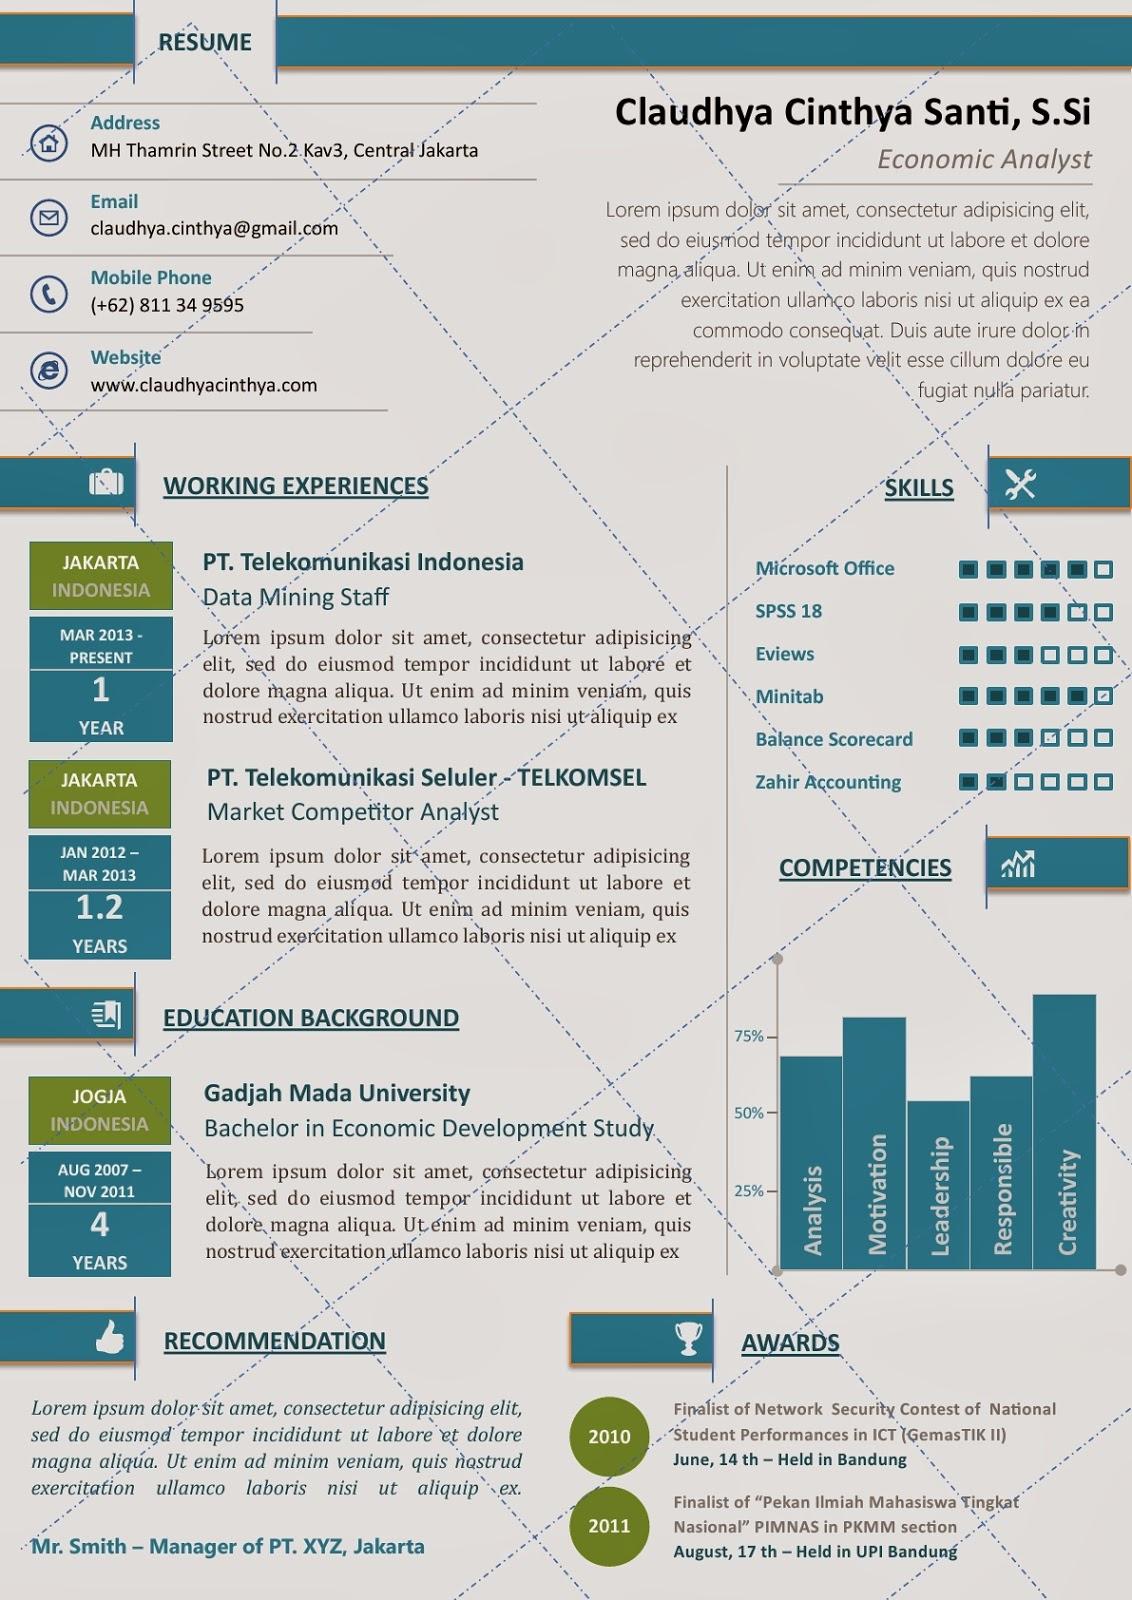 Free Infographic Resume Templates For Ms Word Chesslinksinfo